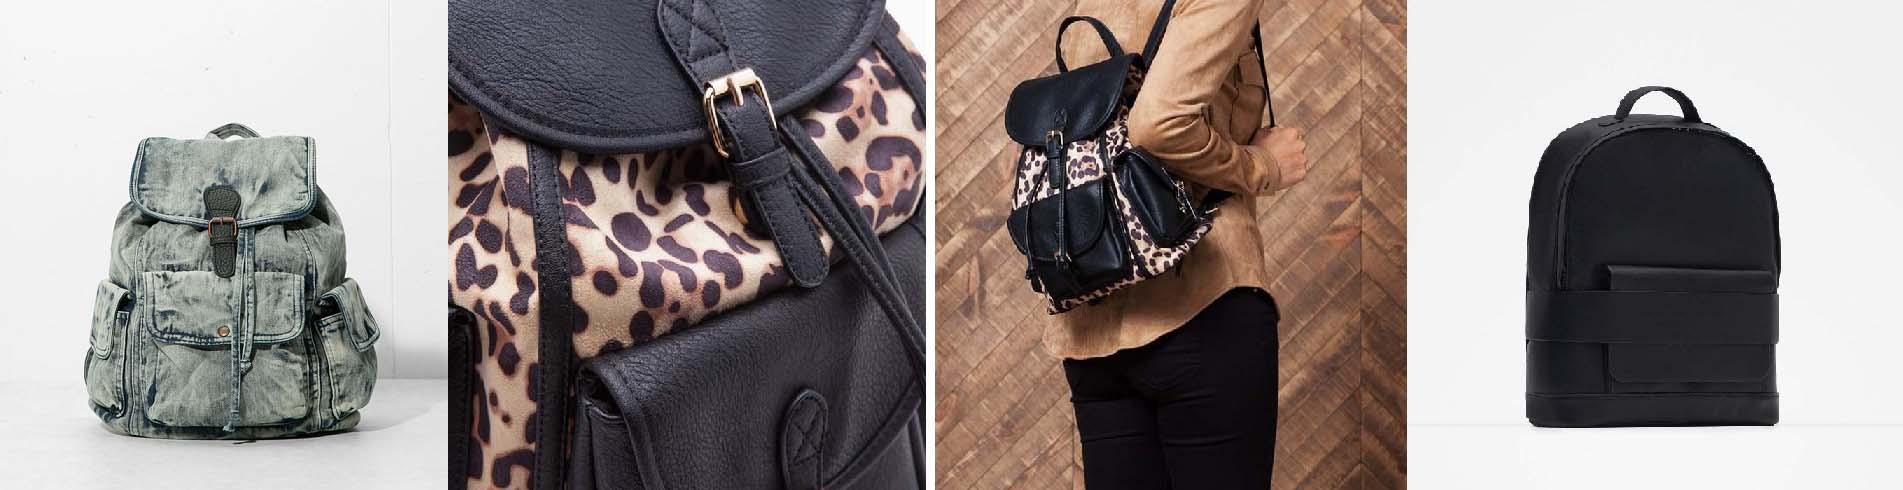 Сумка-рюкзак — ваш удобный аксессуар рюкзак Bershka